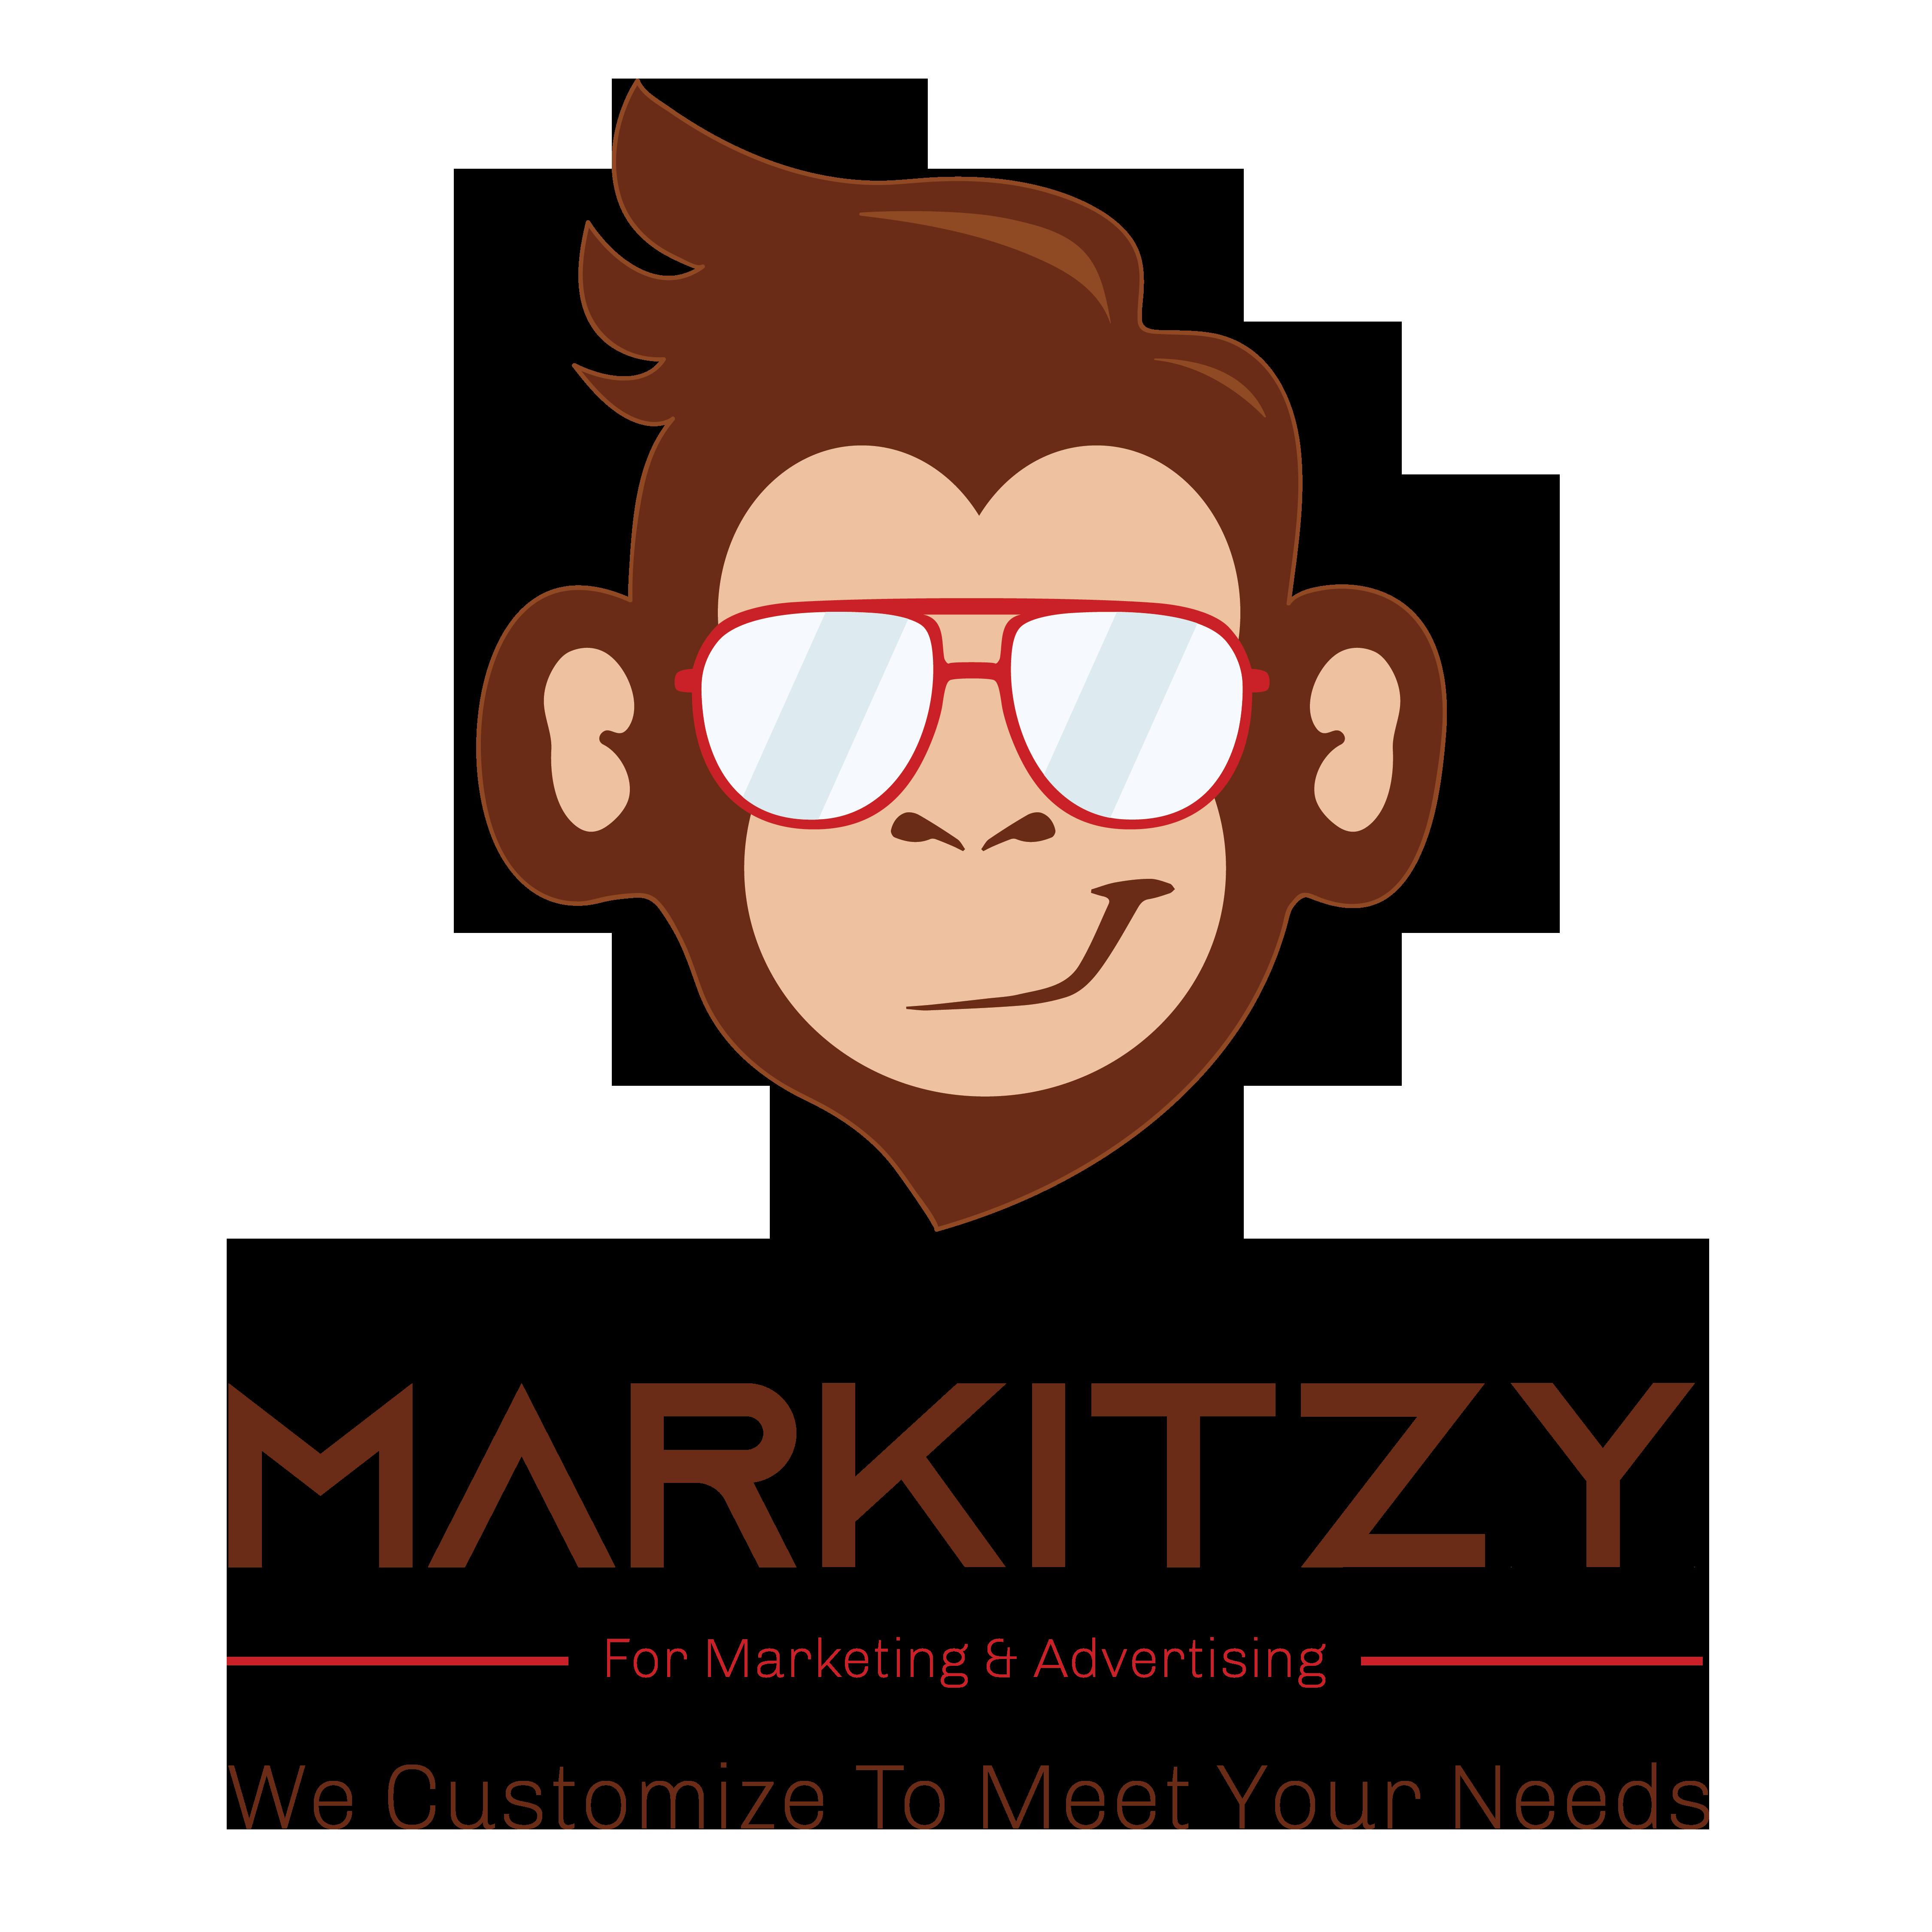 Markitzy